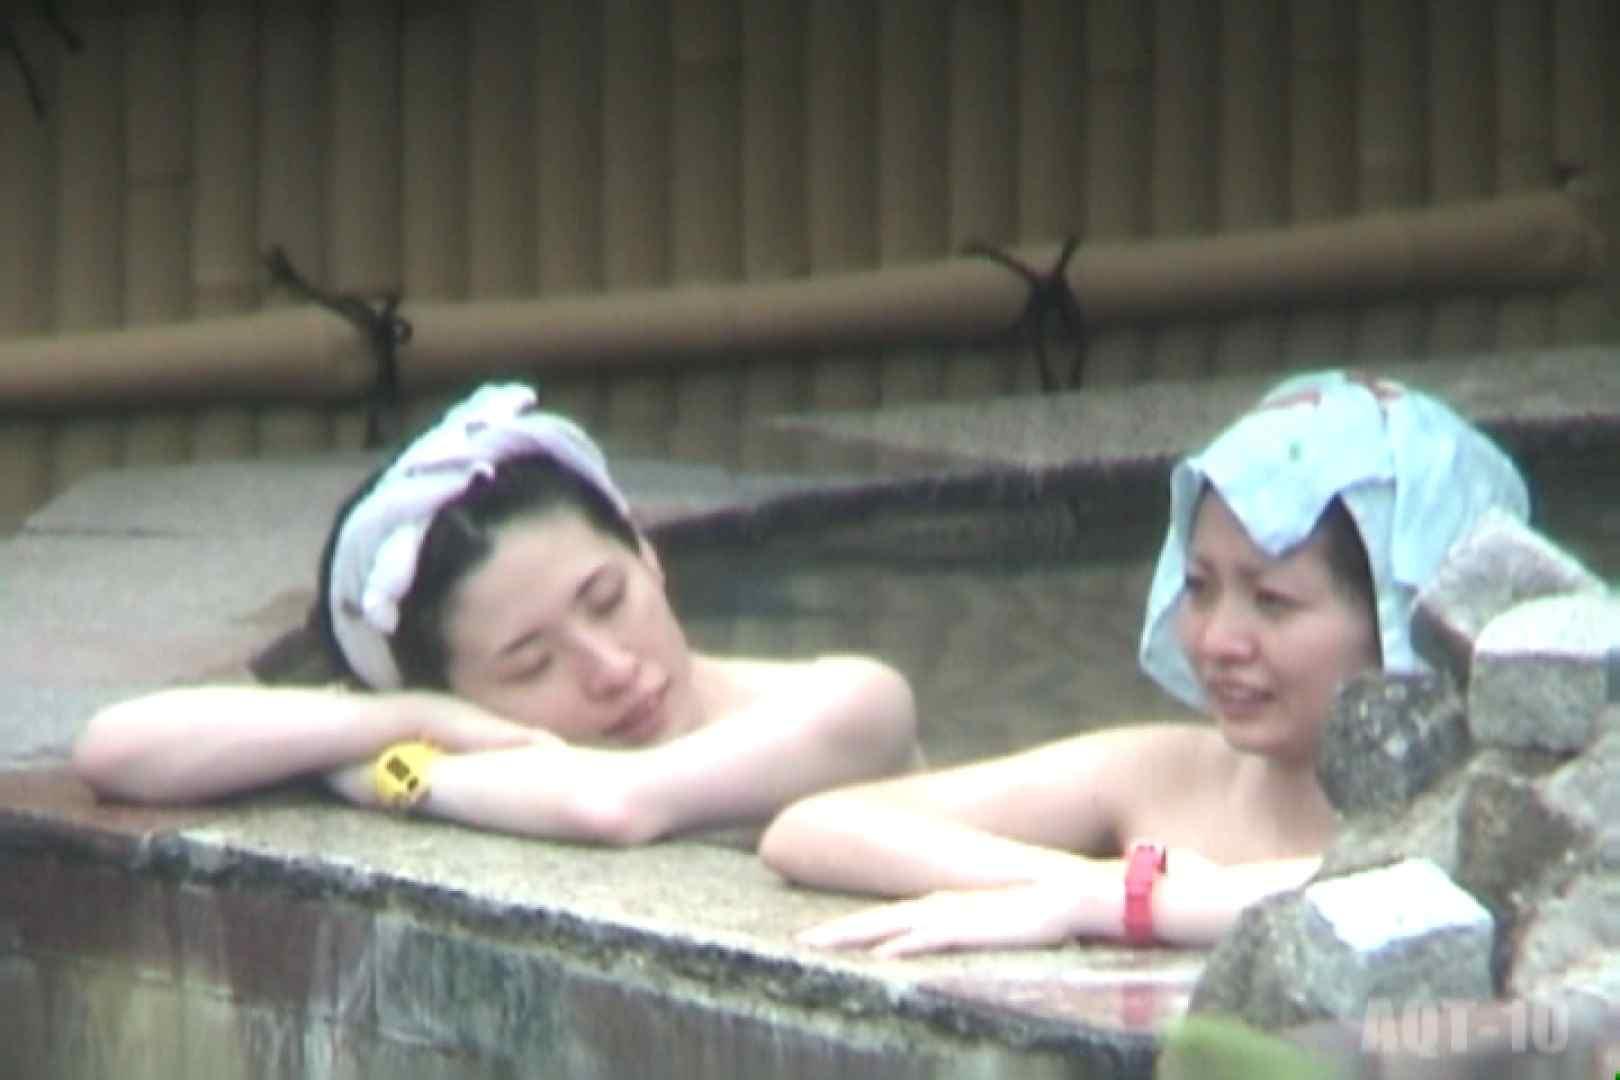 Aquaな露天風呂Vol.793 盗撮映像  72Pix 30